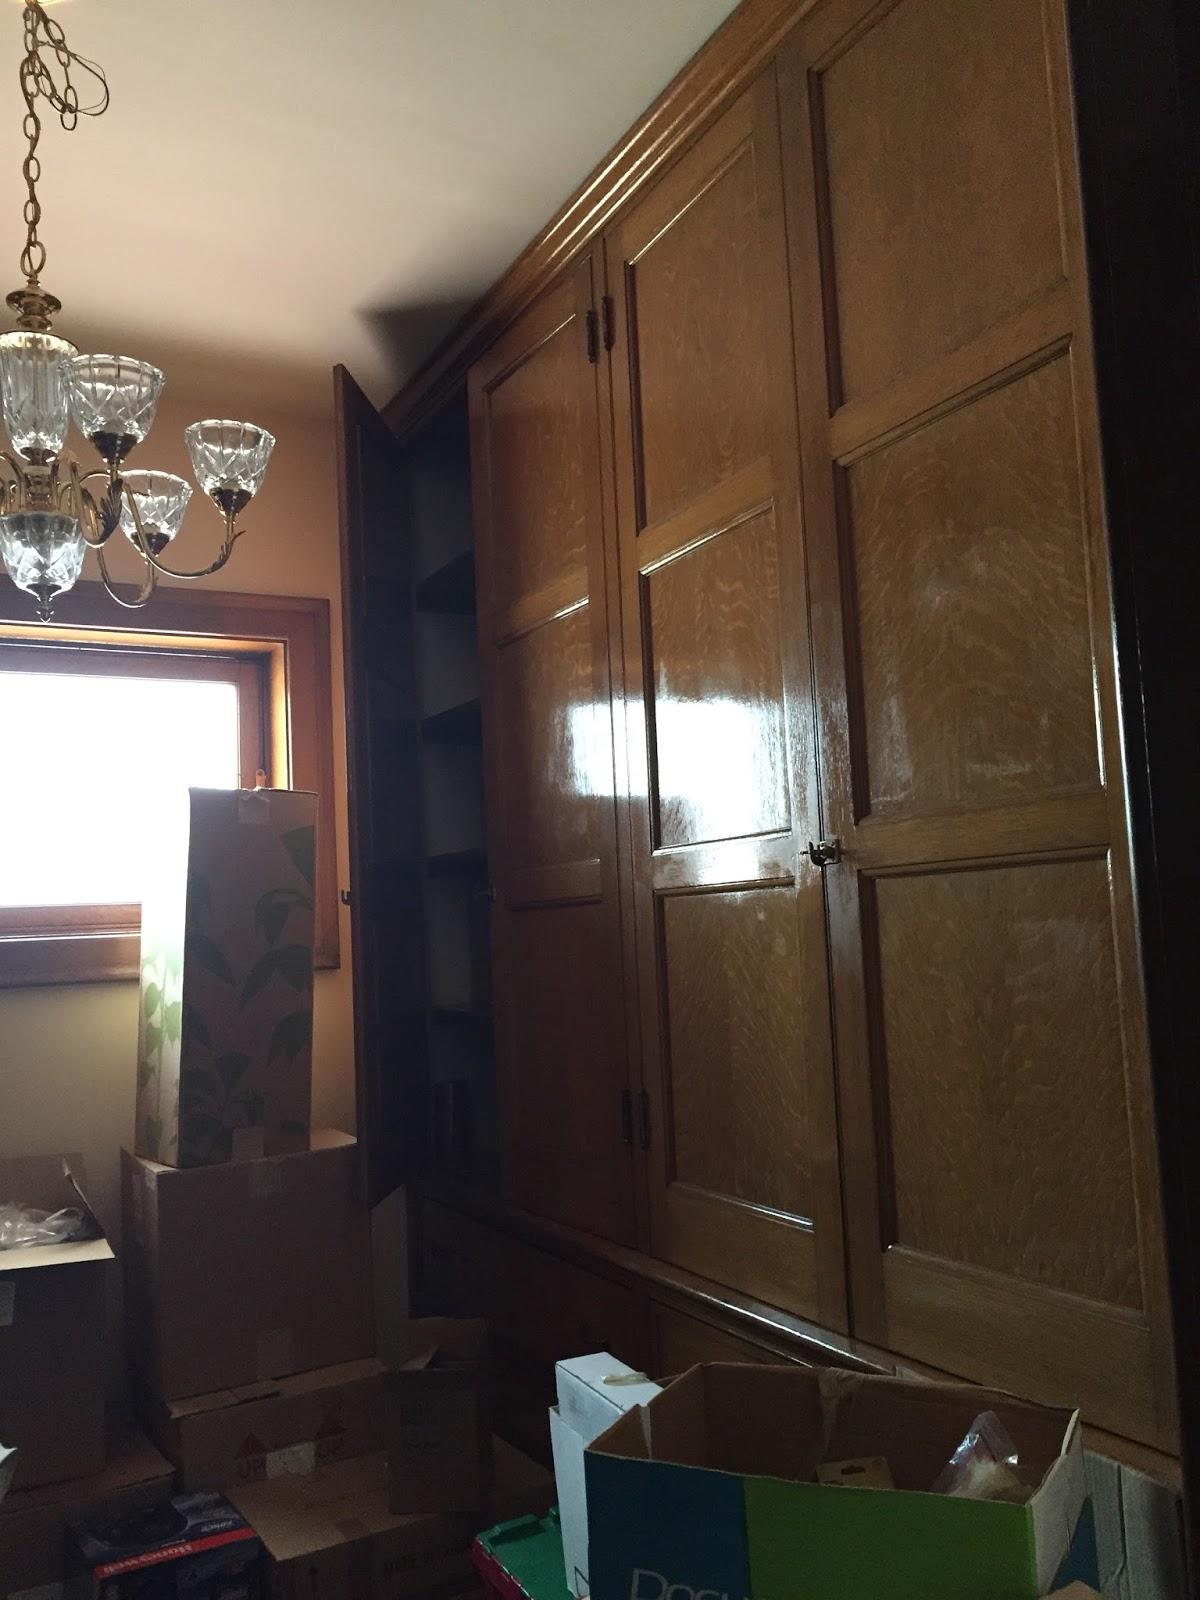 Architect design trumbauer 39 s perry belmont mansion tour for Servant quarters designs